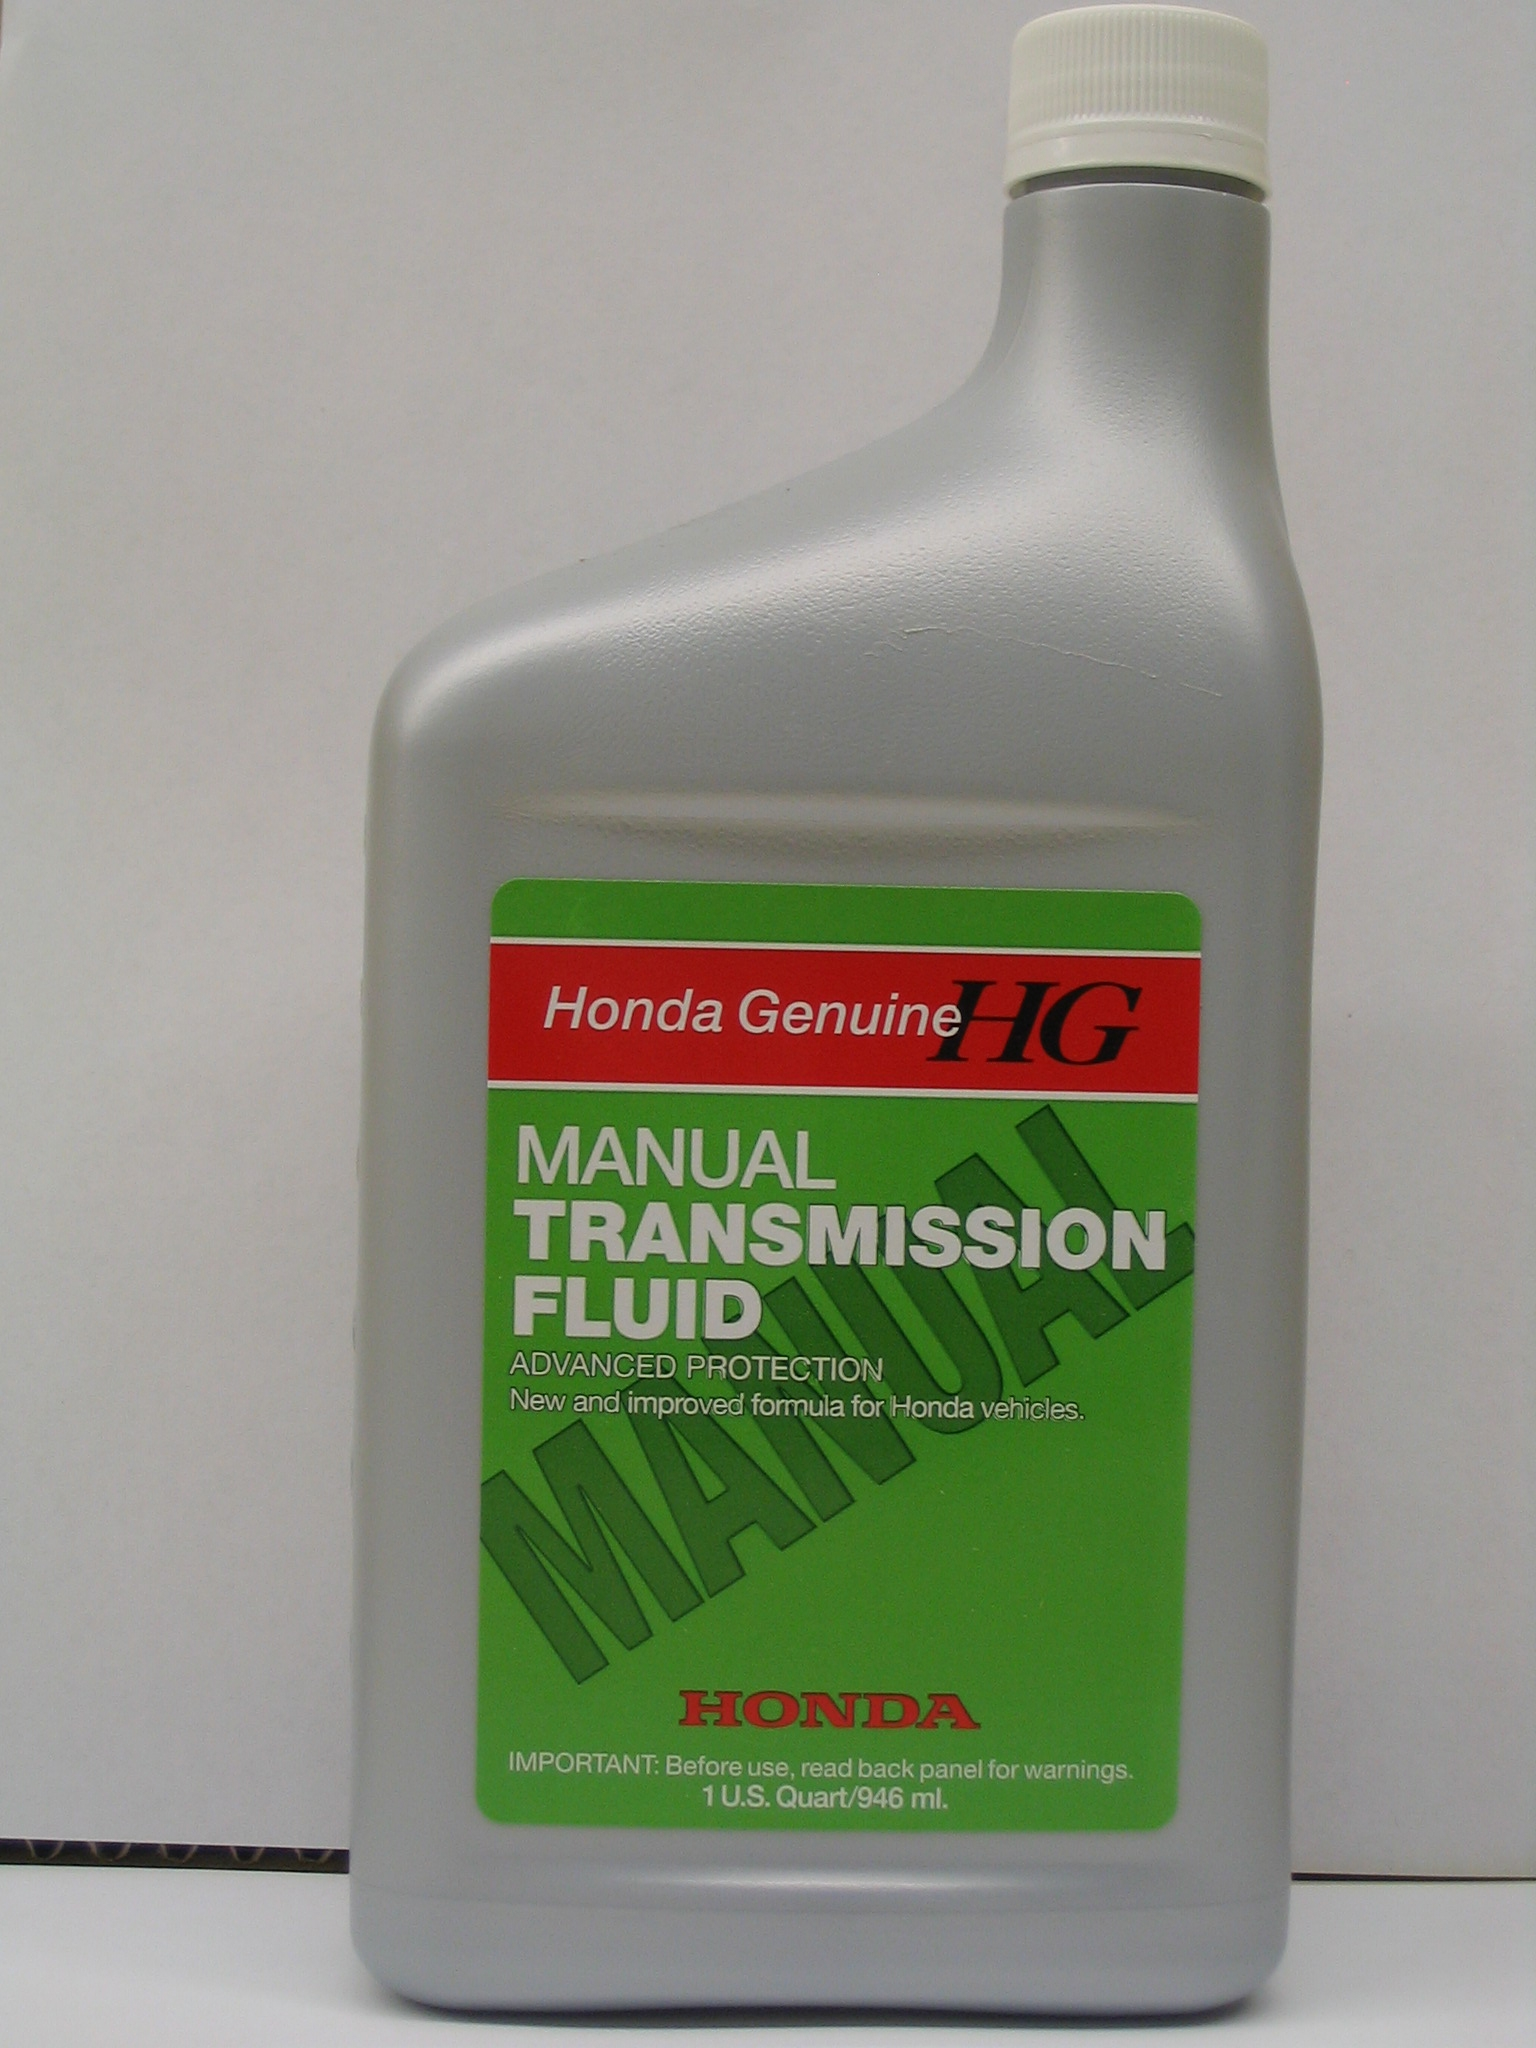 Manual Transmission Fluid Click To Enlarge